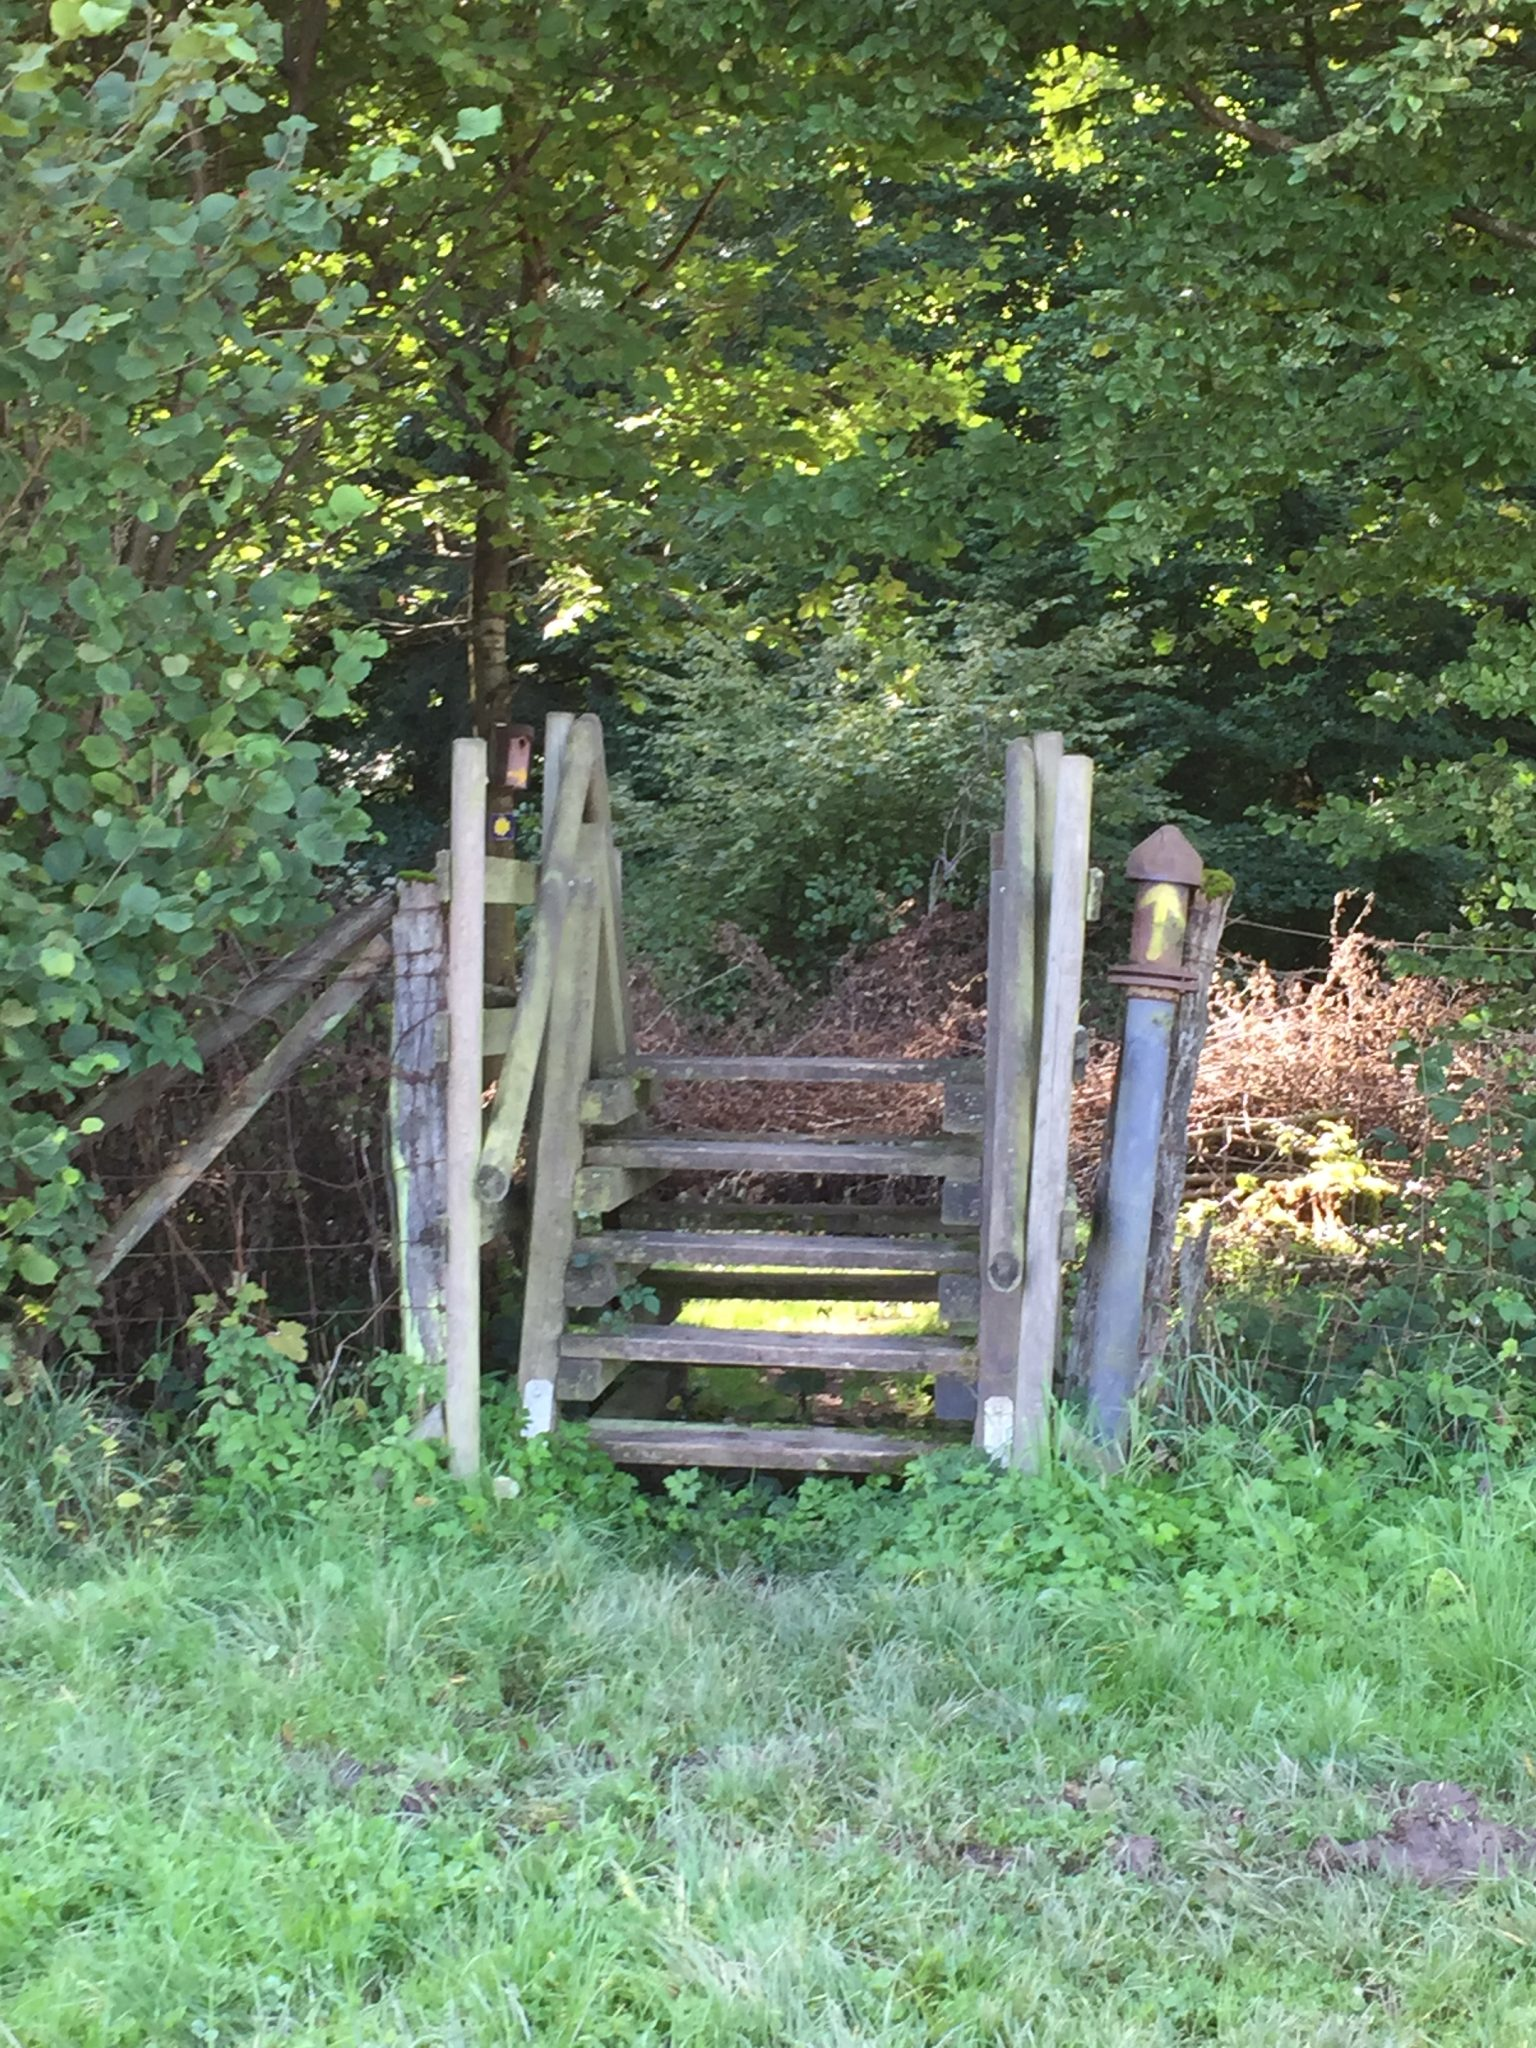 Mosel Camino Etappe 1, Stolzenfels Alken, Weg über Leiter